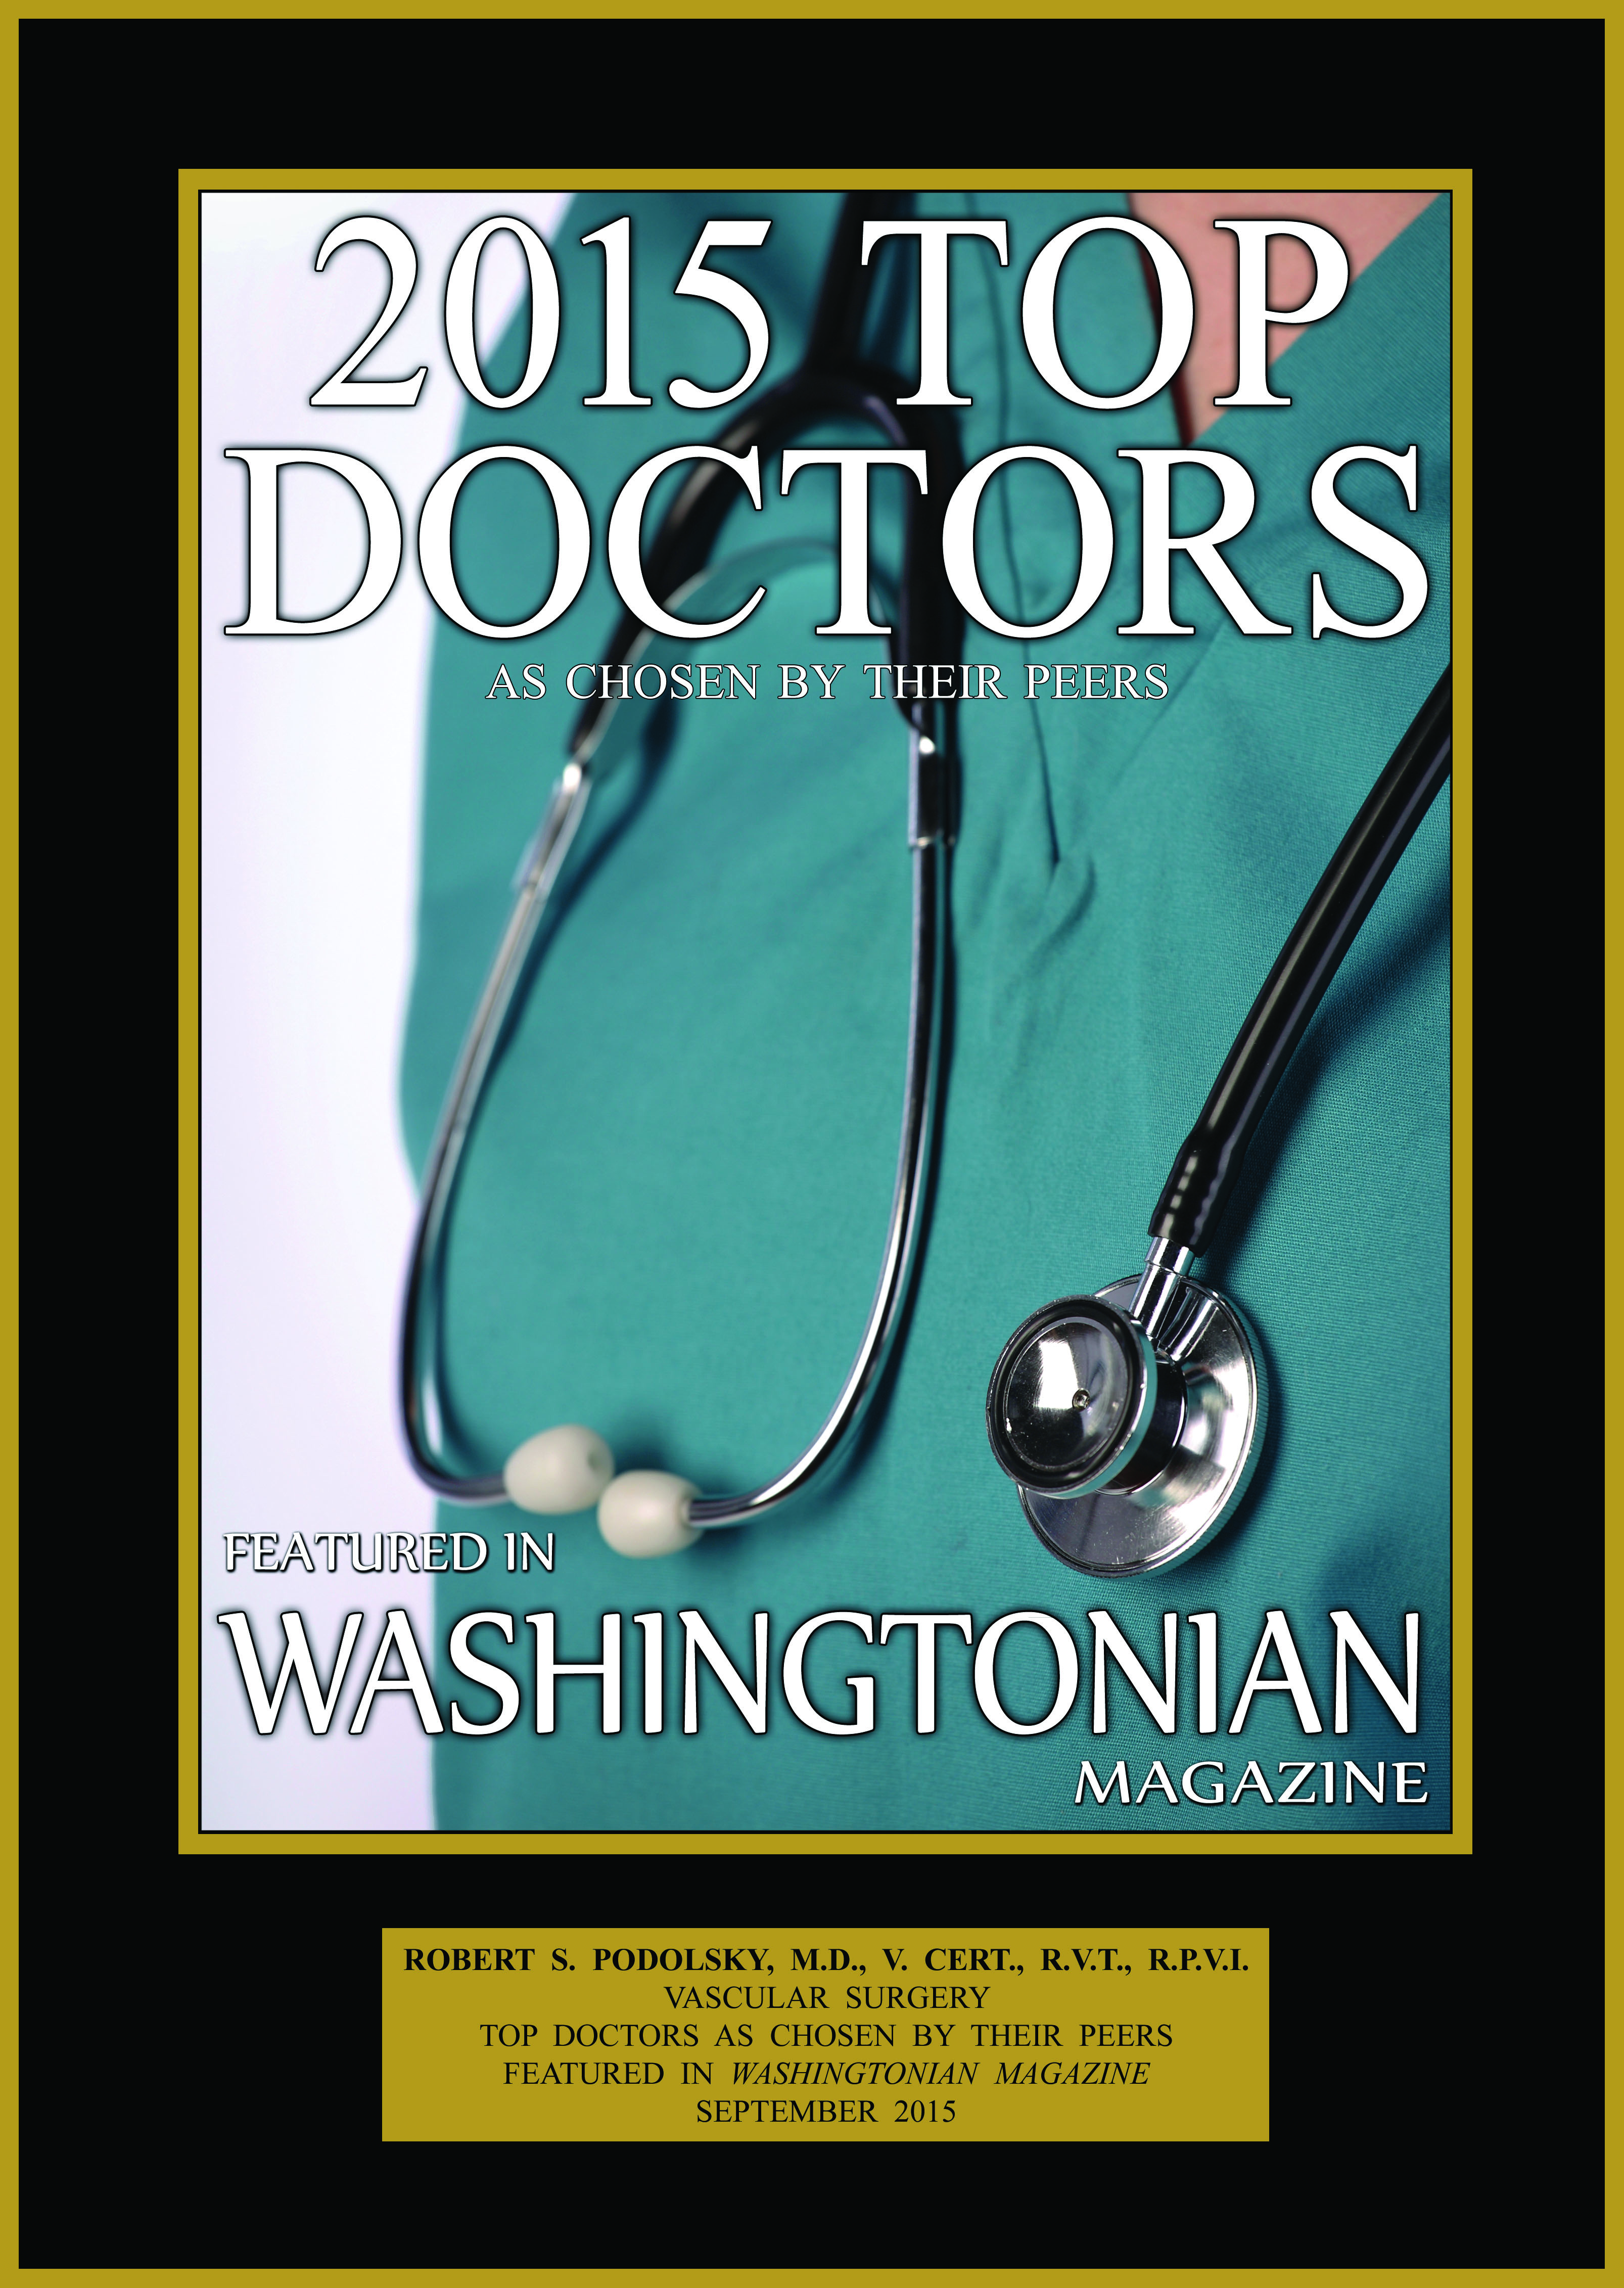 About | Vascular Associates of Northern Virginia